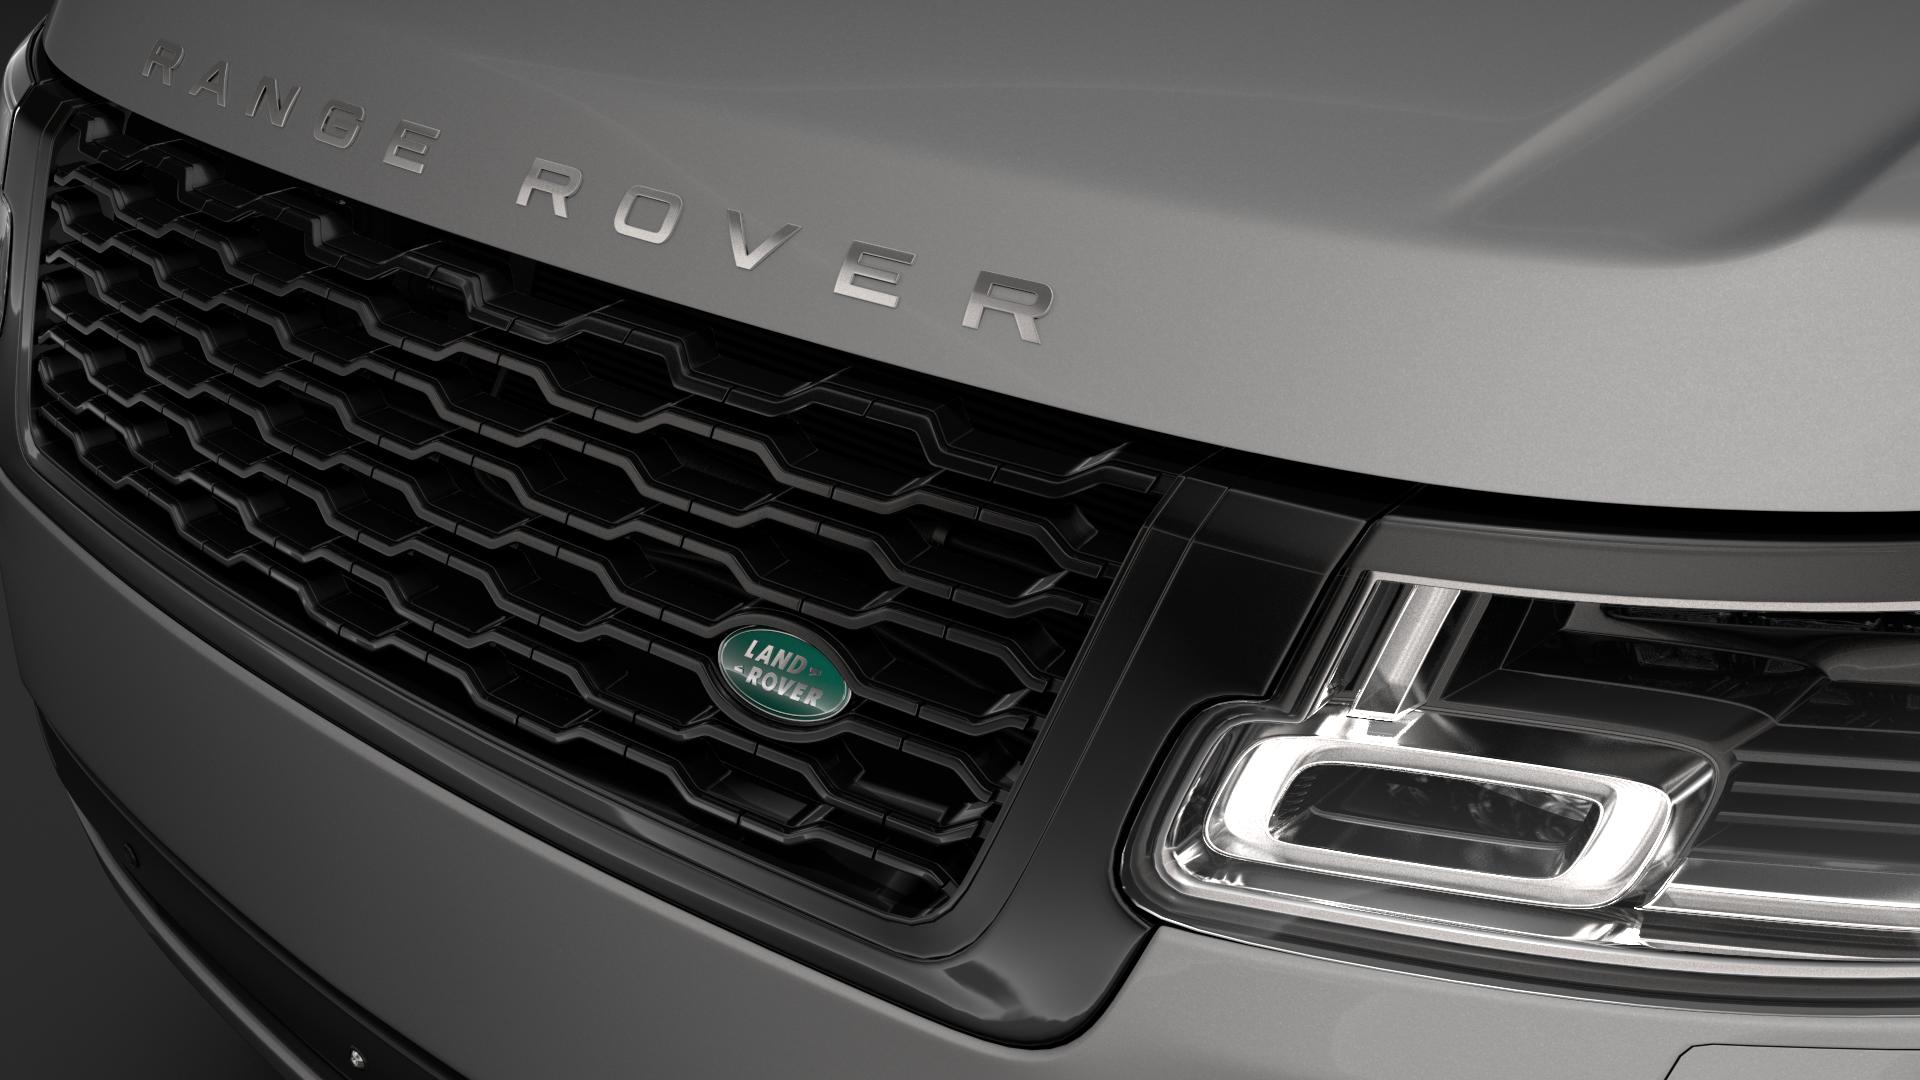 range rover vogue lwb l405 2018 3d model max fbx c4d lwo ma mb hrc xsi obj 277526